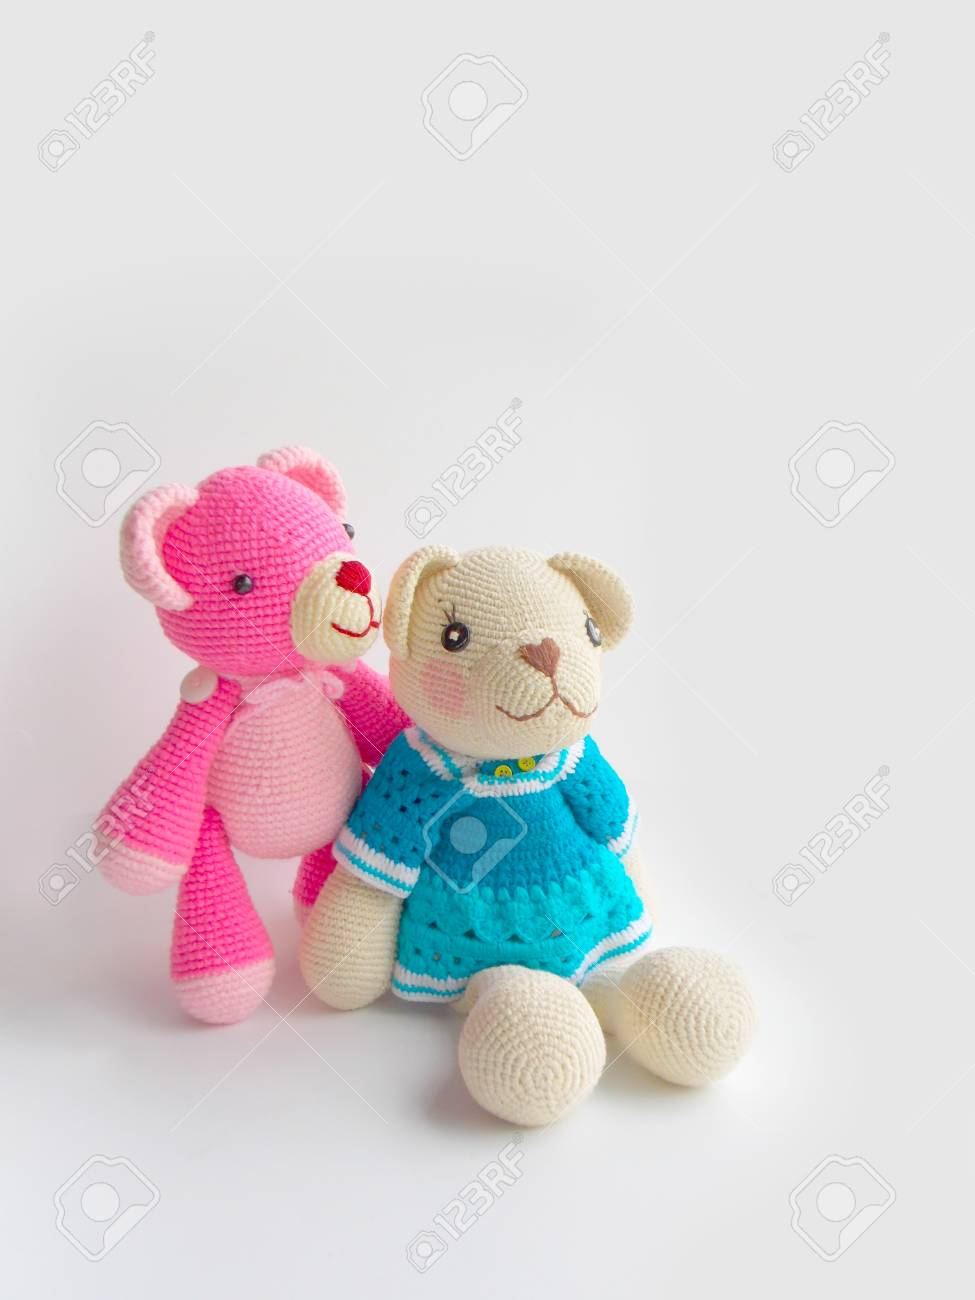 Crochet Teddy Bear Girl Plush Toys Crochet Bears Handmade | Etsy | 1300x975